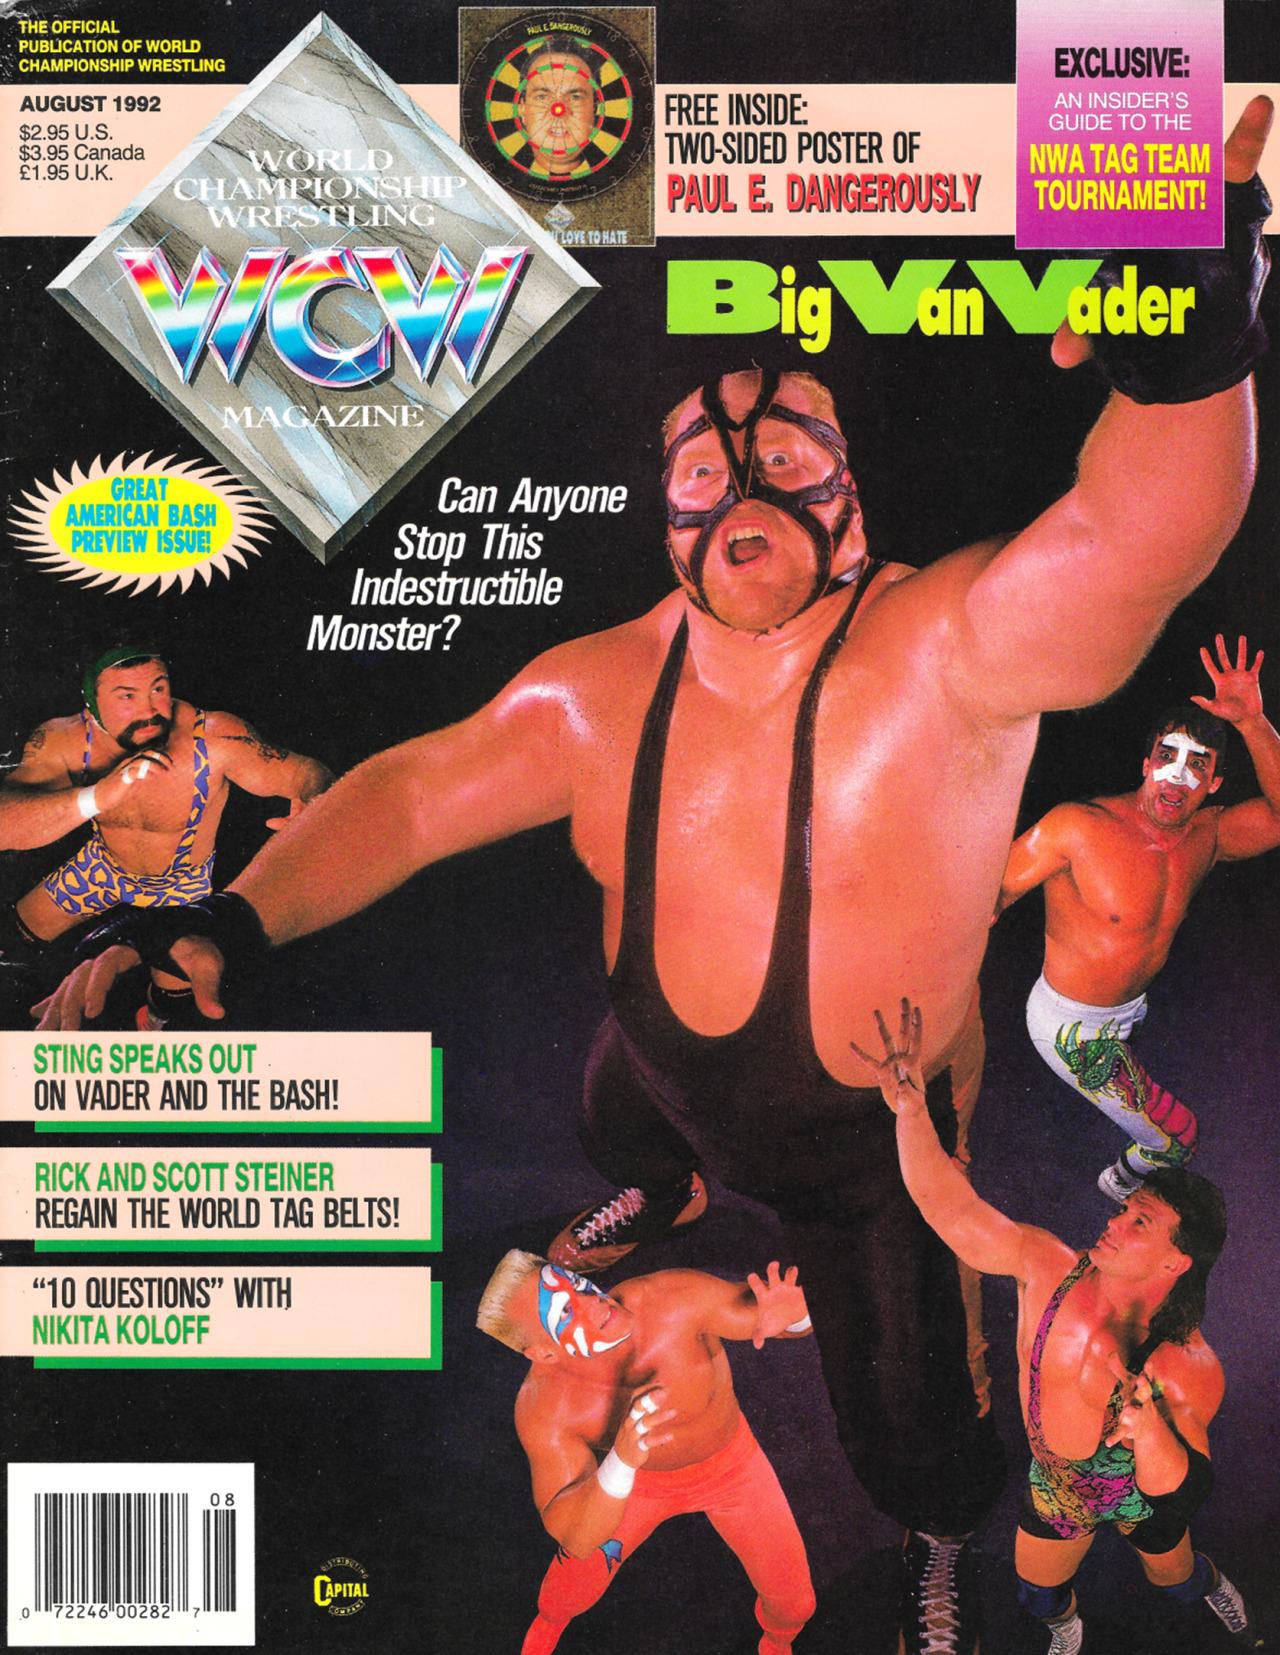 morgan cruise wrestling